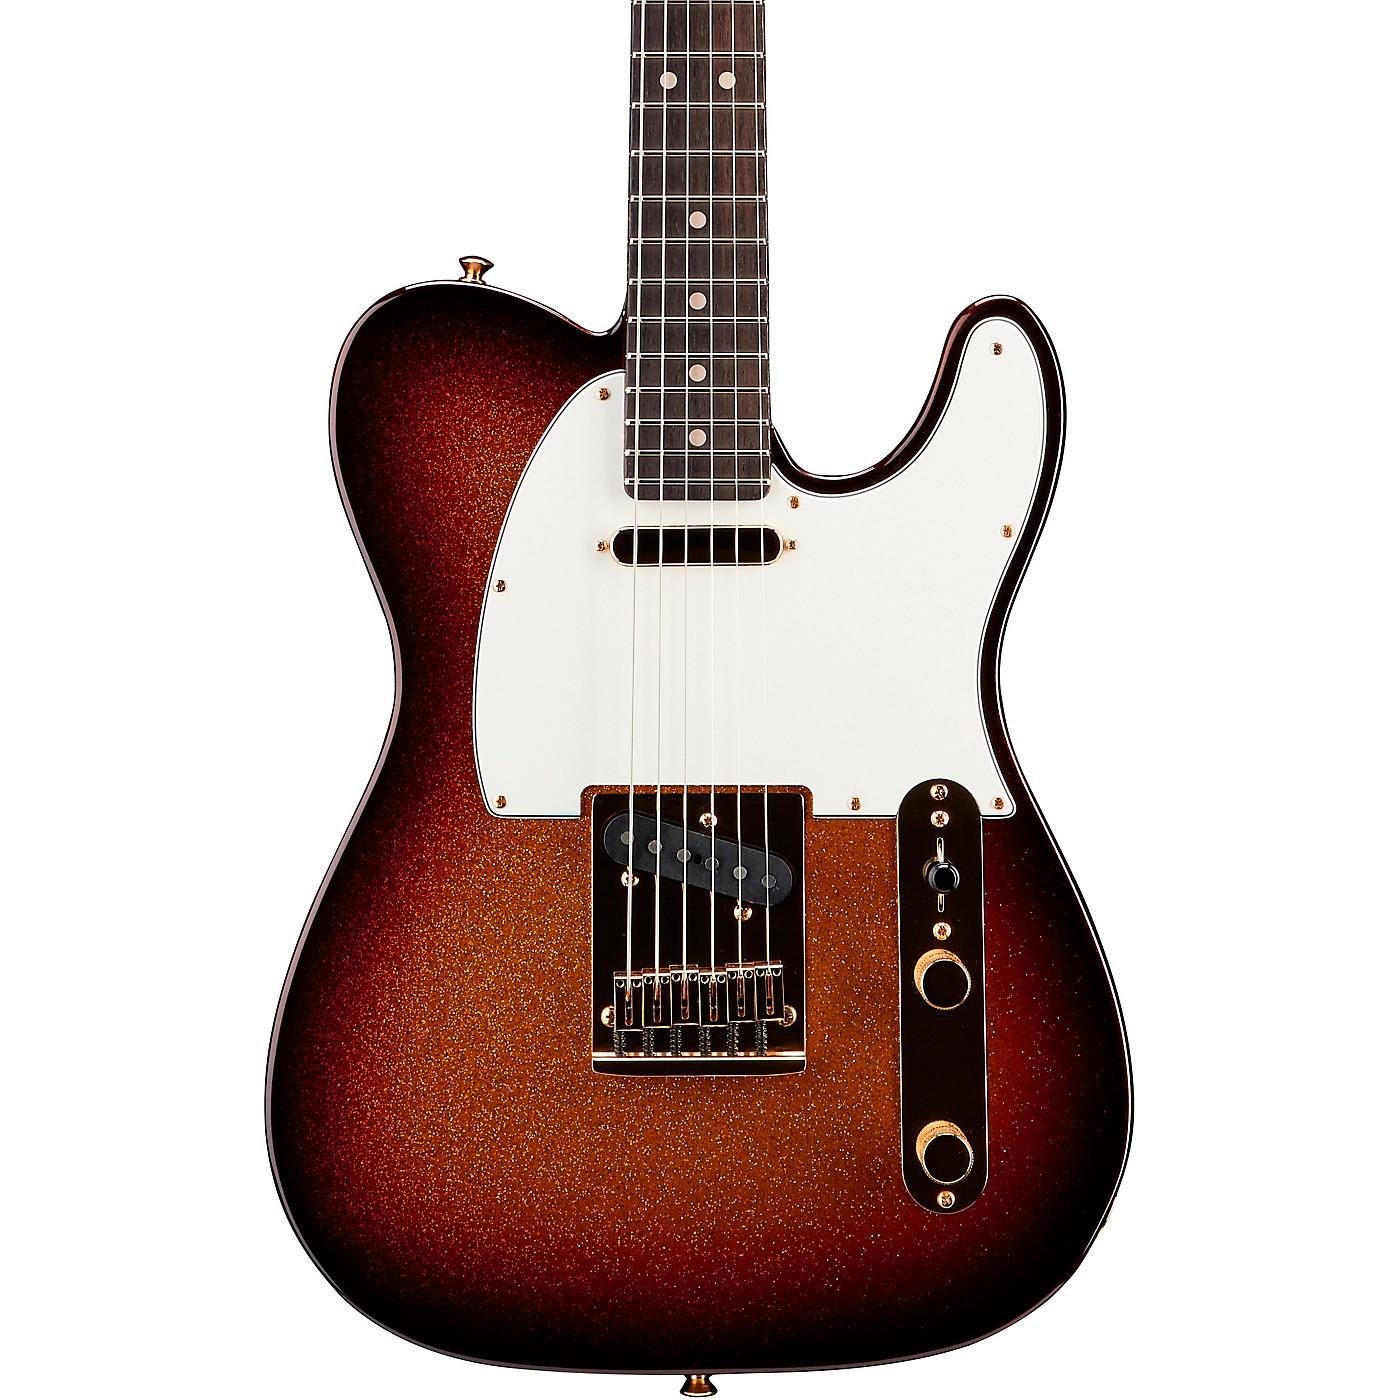 Fender Custom Shop Super Custom Deluxe Telecaster Electric Guitar thumbnail